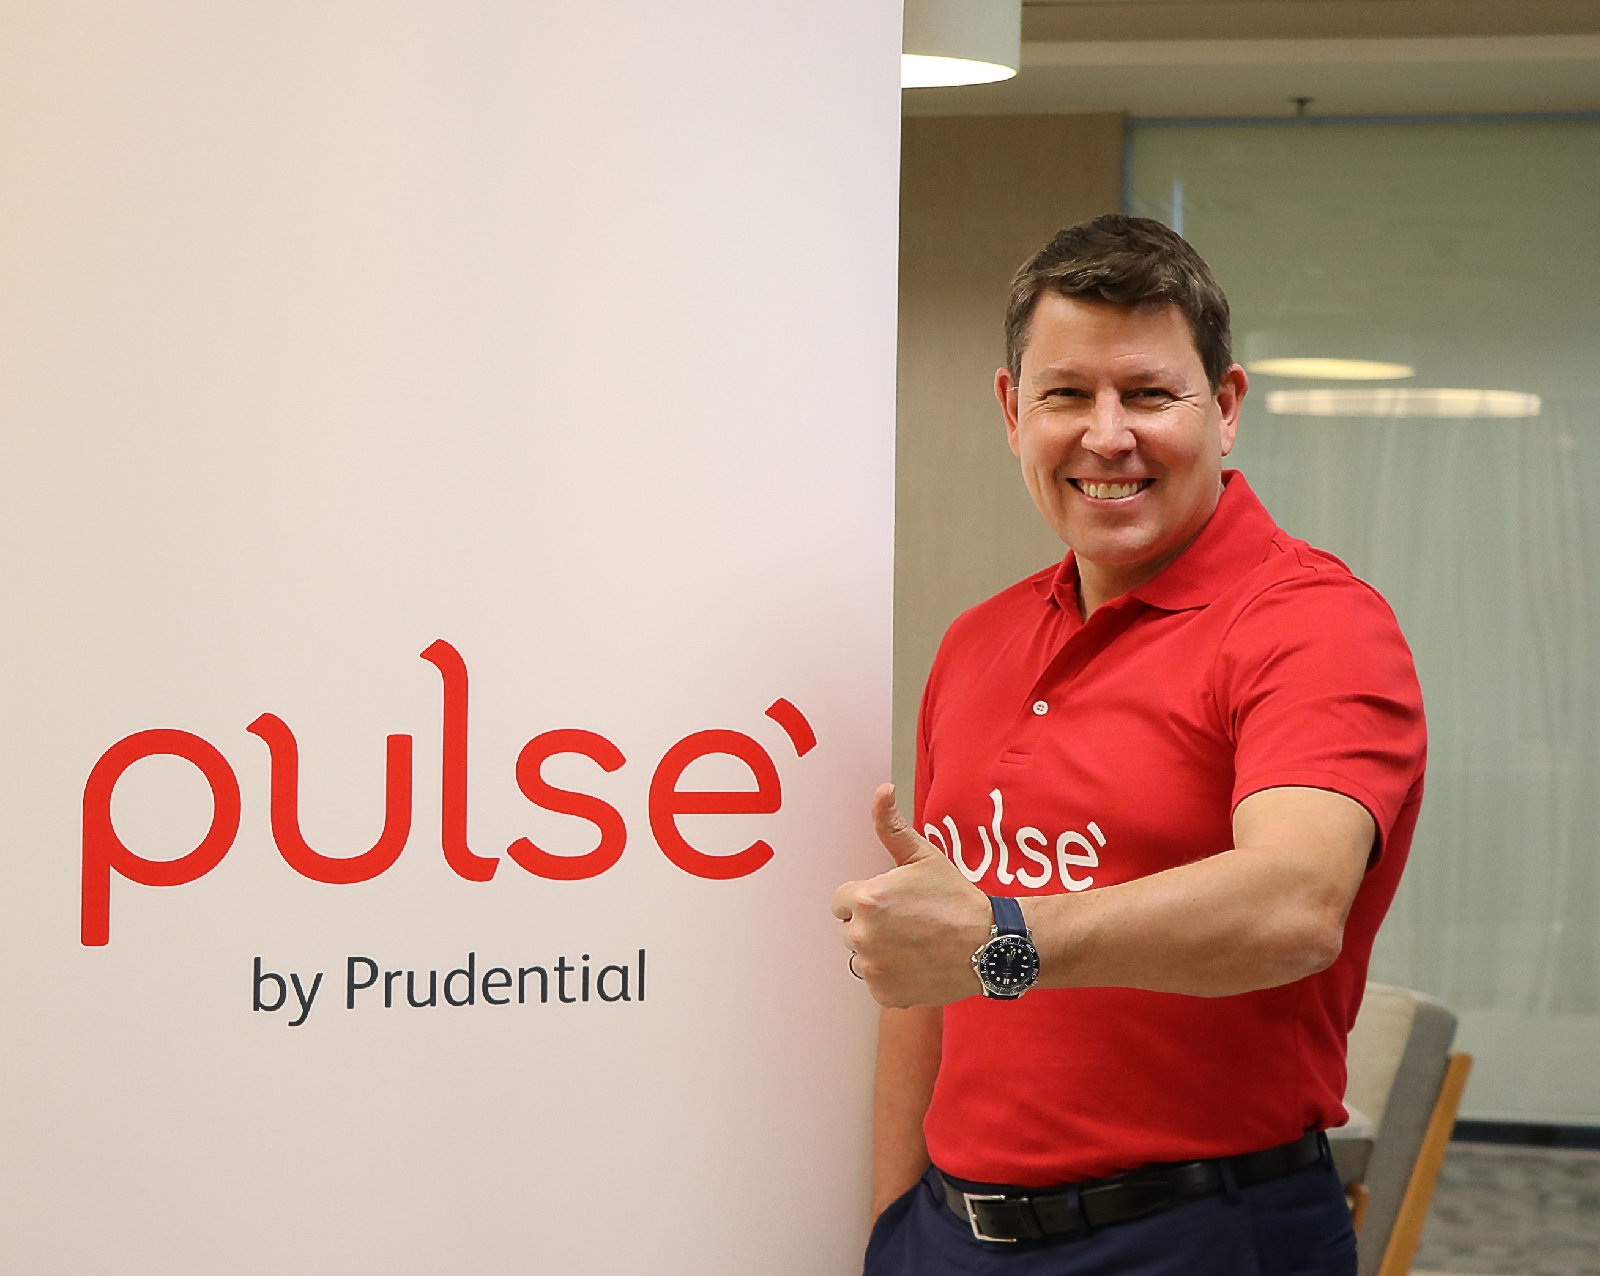 Prudential TH เปิดตัว Pulse by Prudential แอปพลิเคชันสุขภาพที่สนับสนุนให้คนไทยหันมาใส่ใจสุขภาพ